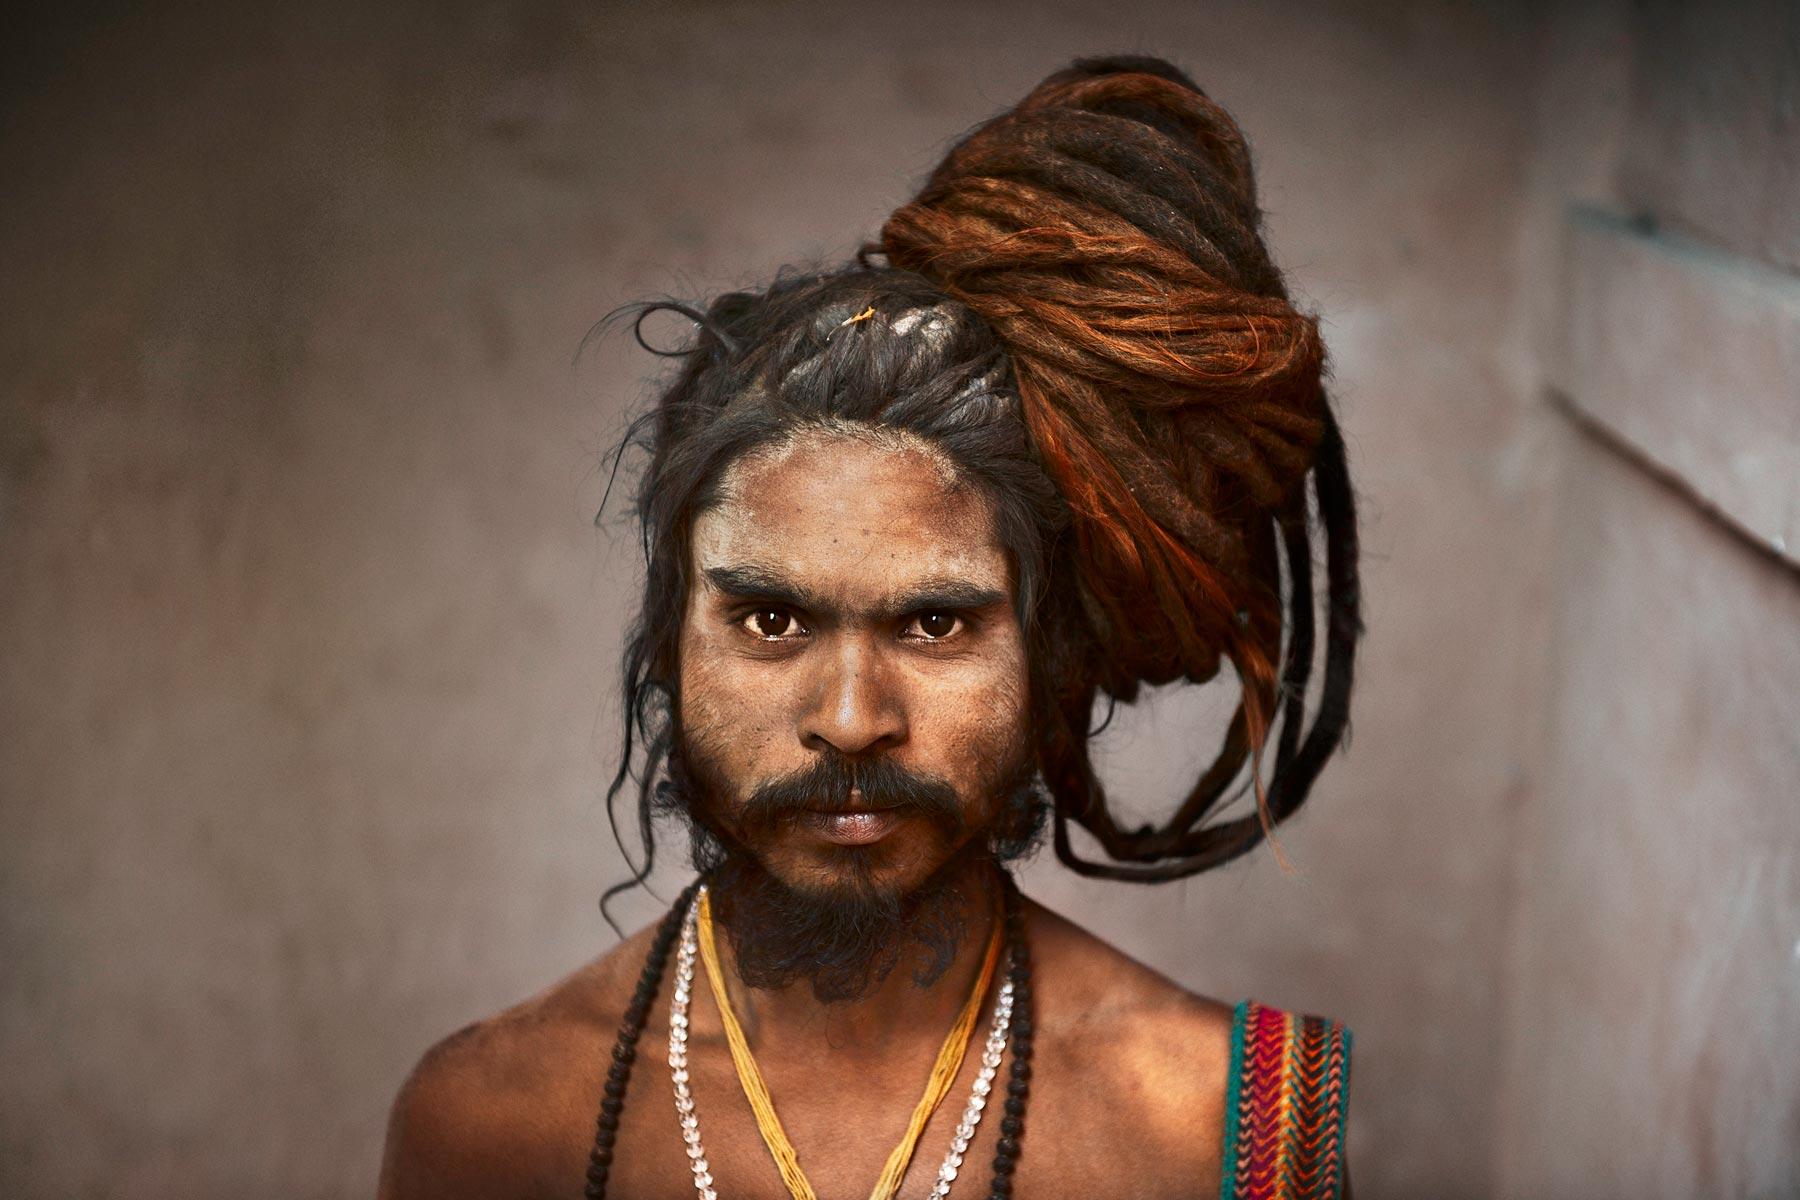 El Poder de la Mirada II - Fotografías de Steve McCurry